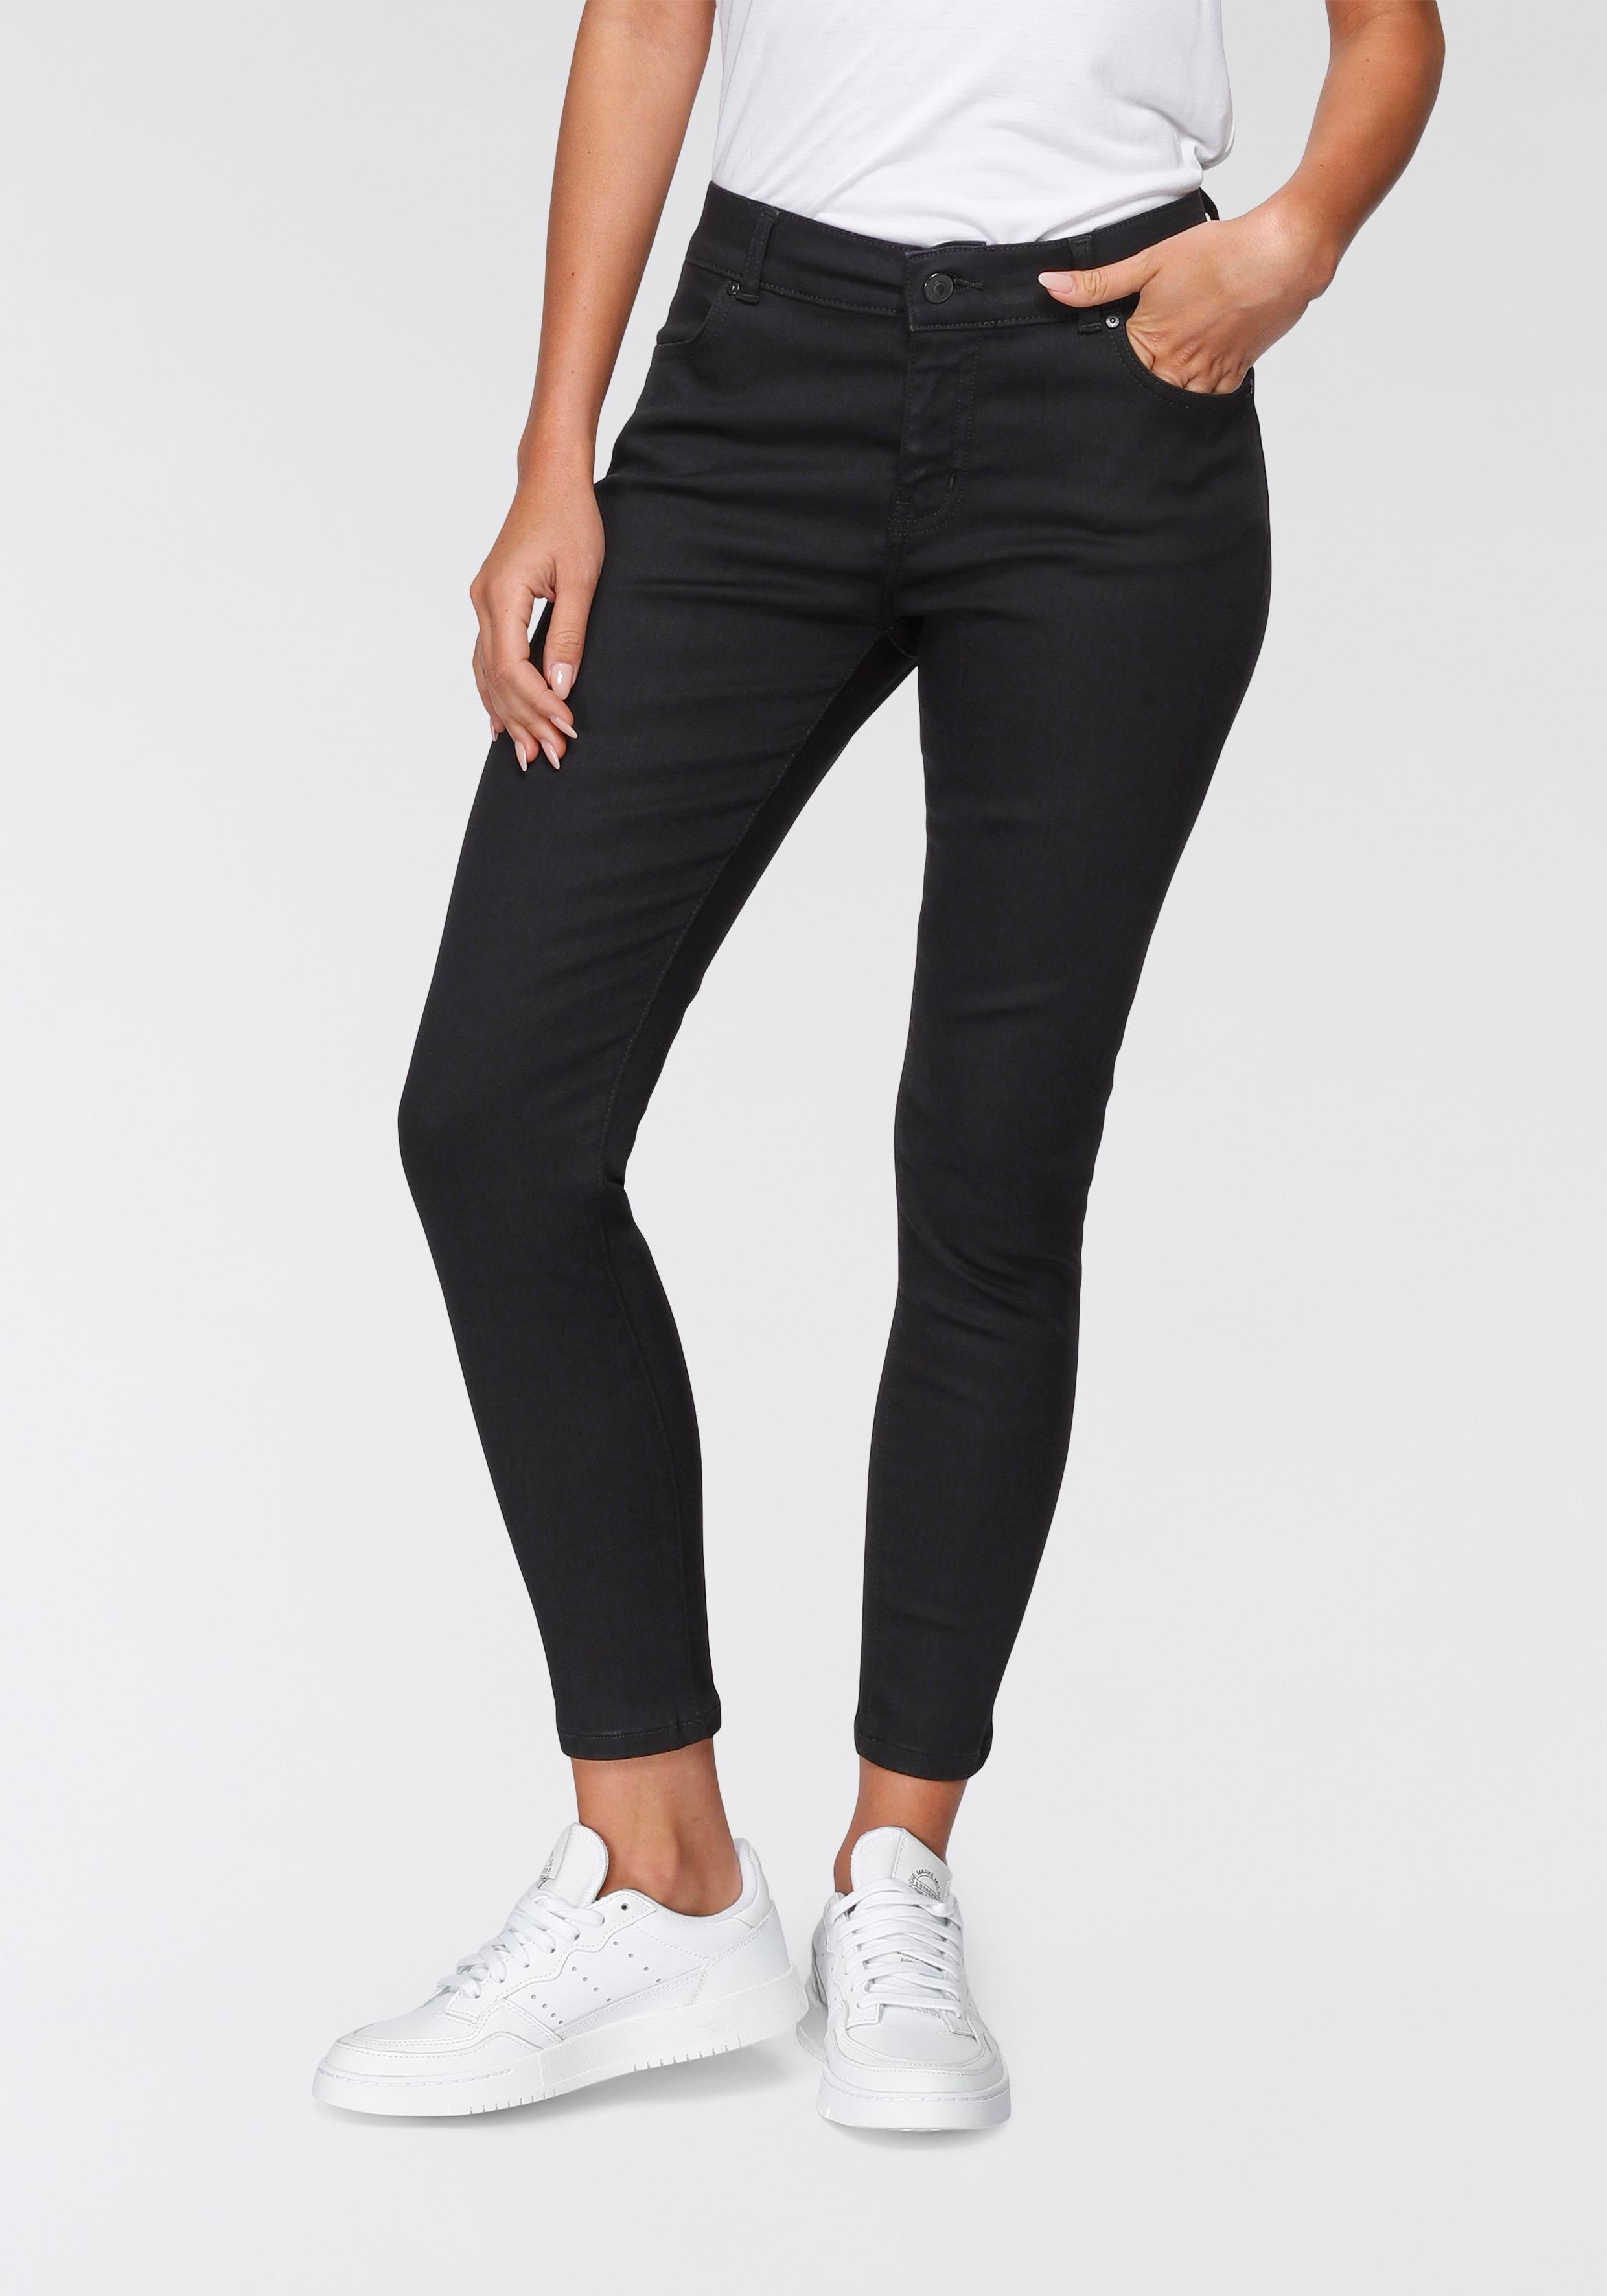 ltb -  Skinny-fit-Jeans LONIA, mit extra engem Bein und normaler Leibhöhe